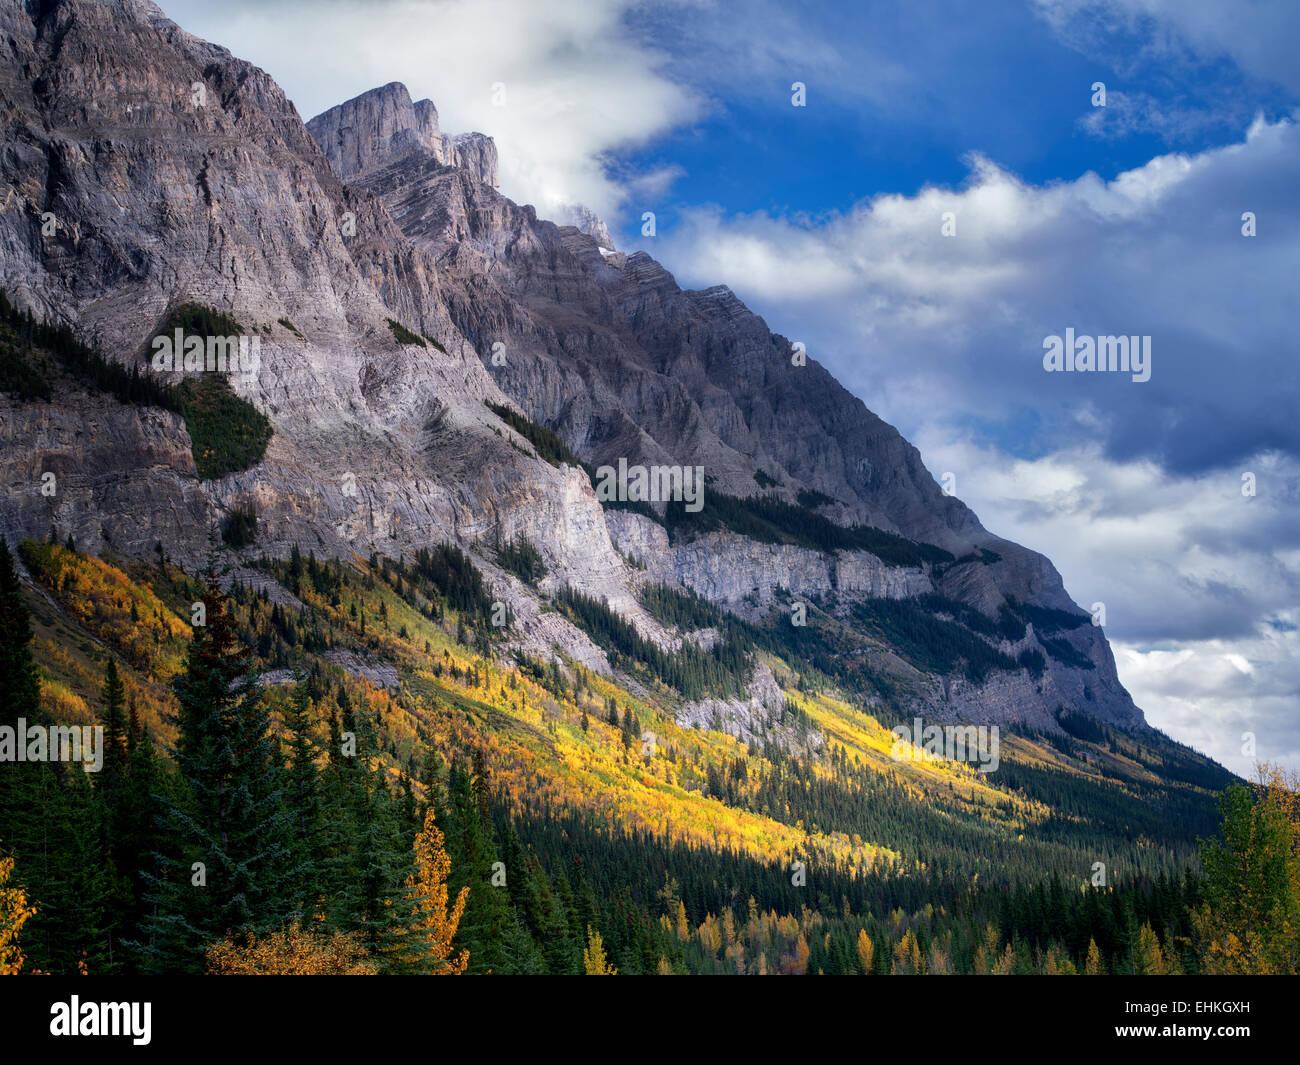 Berghang mit fallen farbige Espe Bäume. Banff Nationalpark, Alberta, Kanada Stockbild